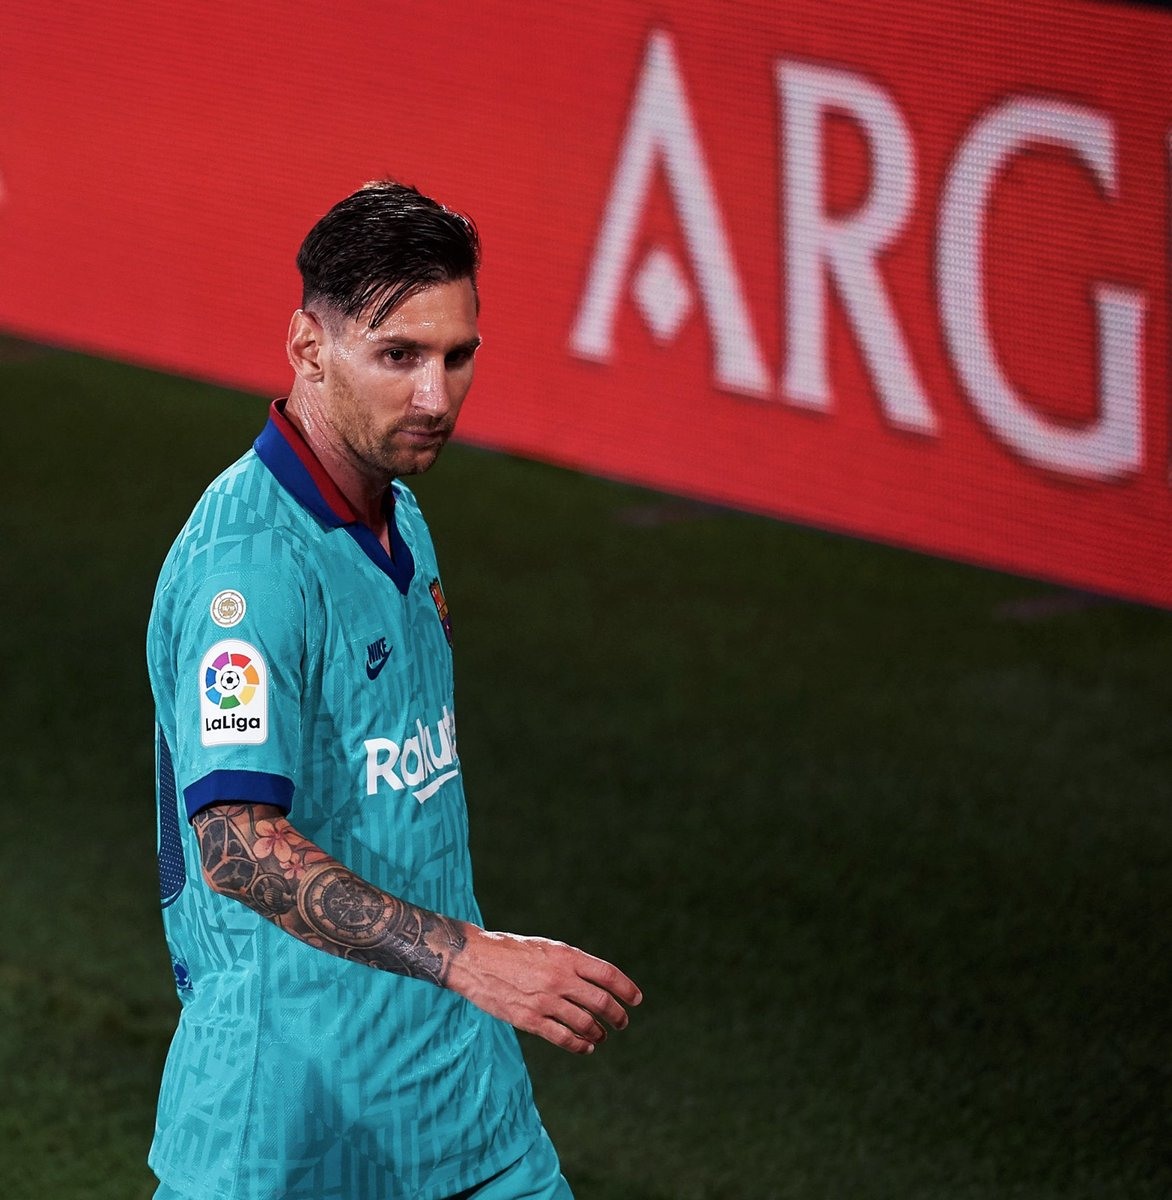 @WeAreMessi's photo on Messi